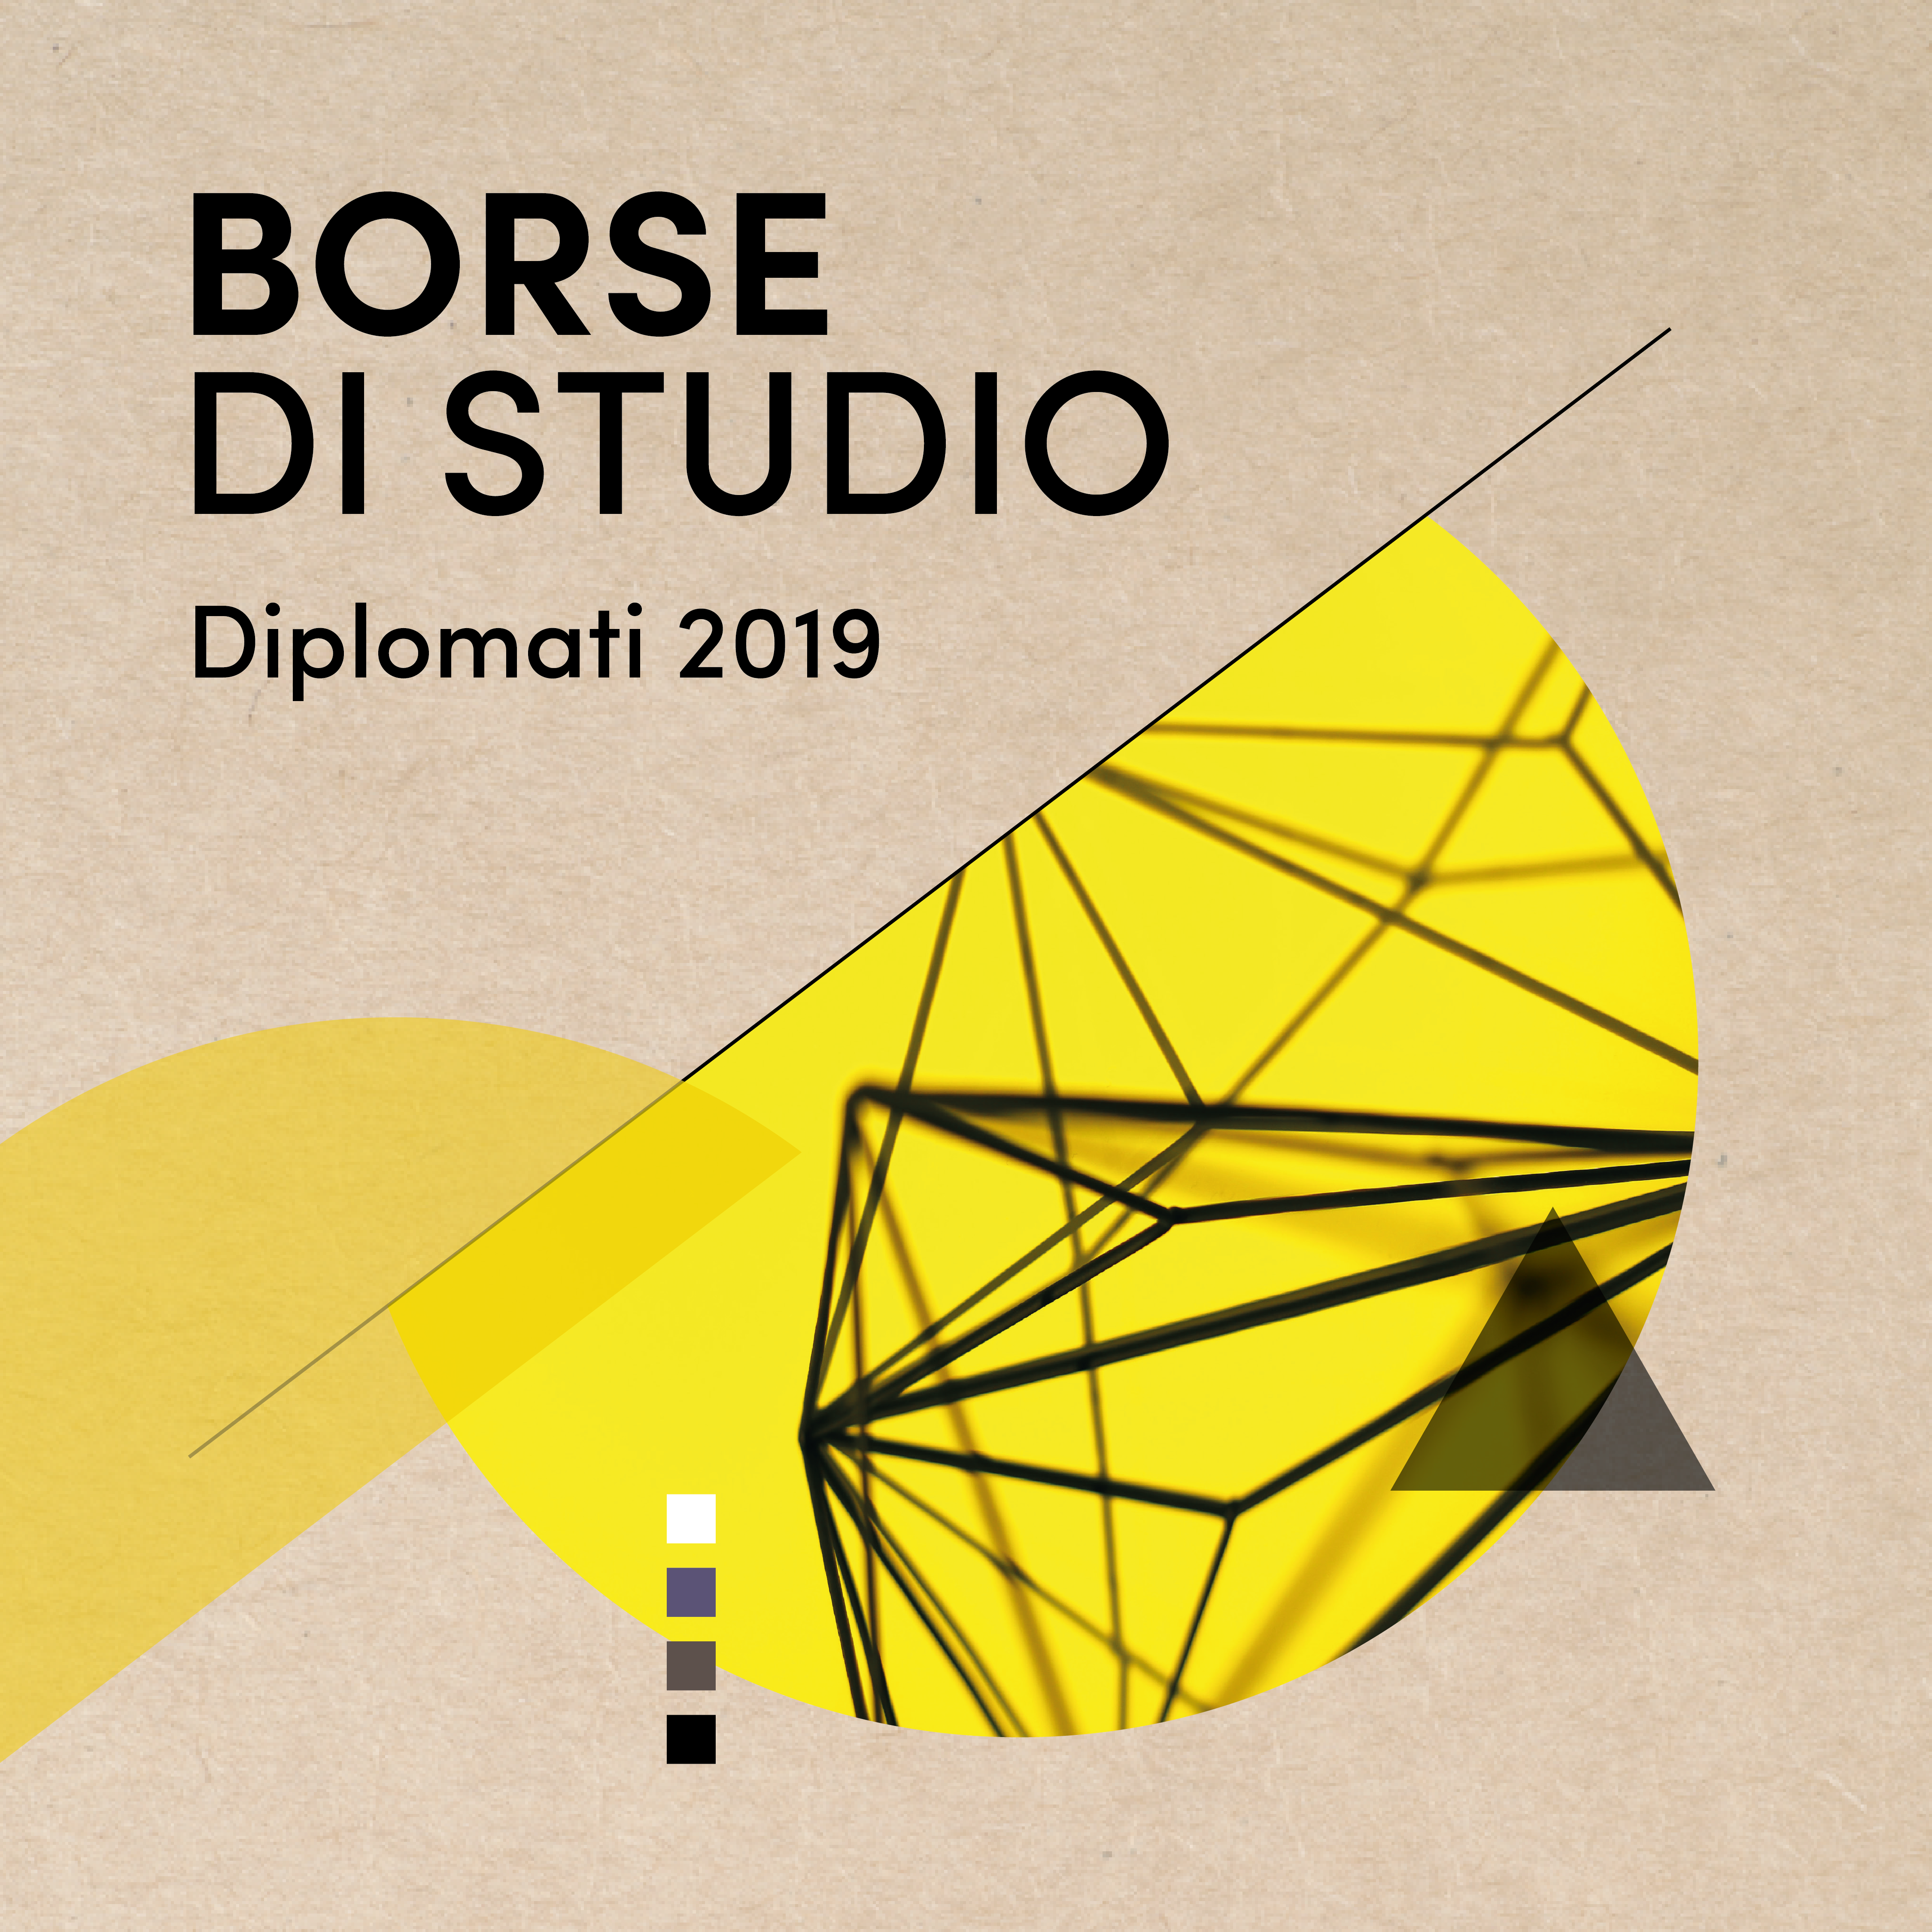 Borse di studio per Diplomati 2019 - Lauree Triennali